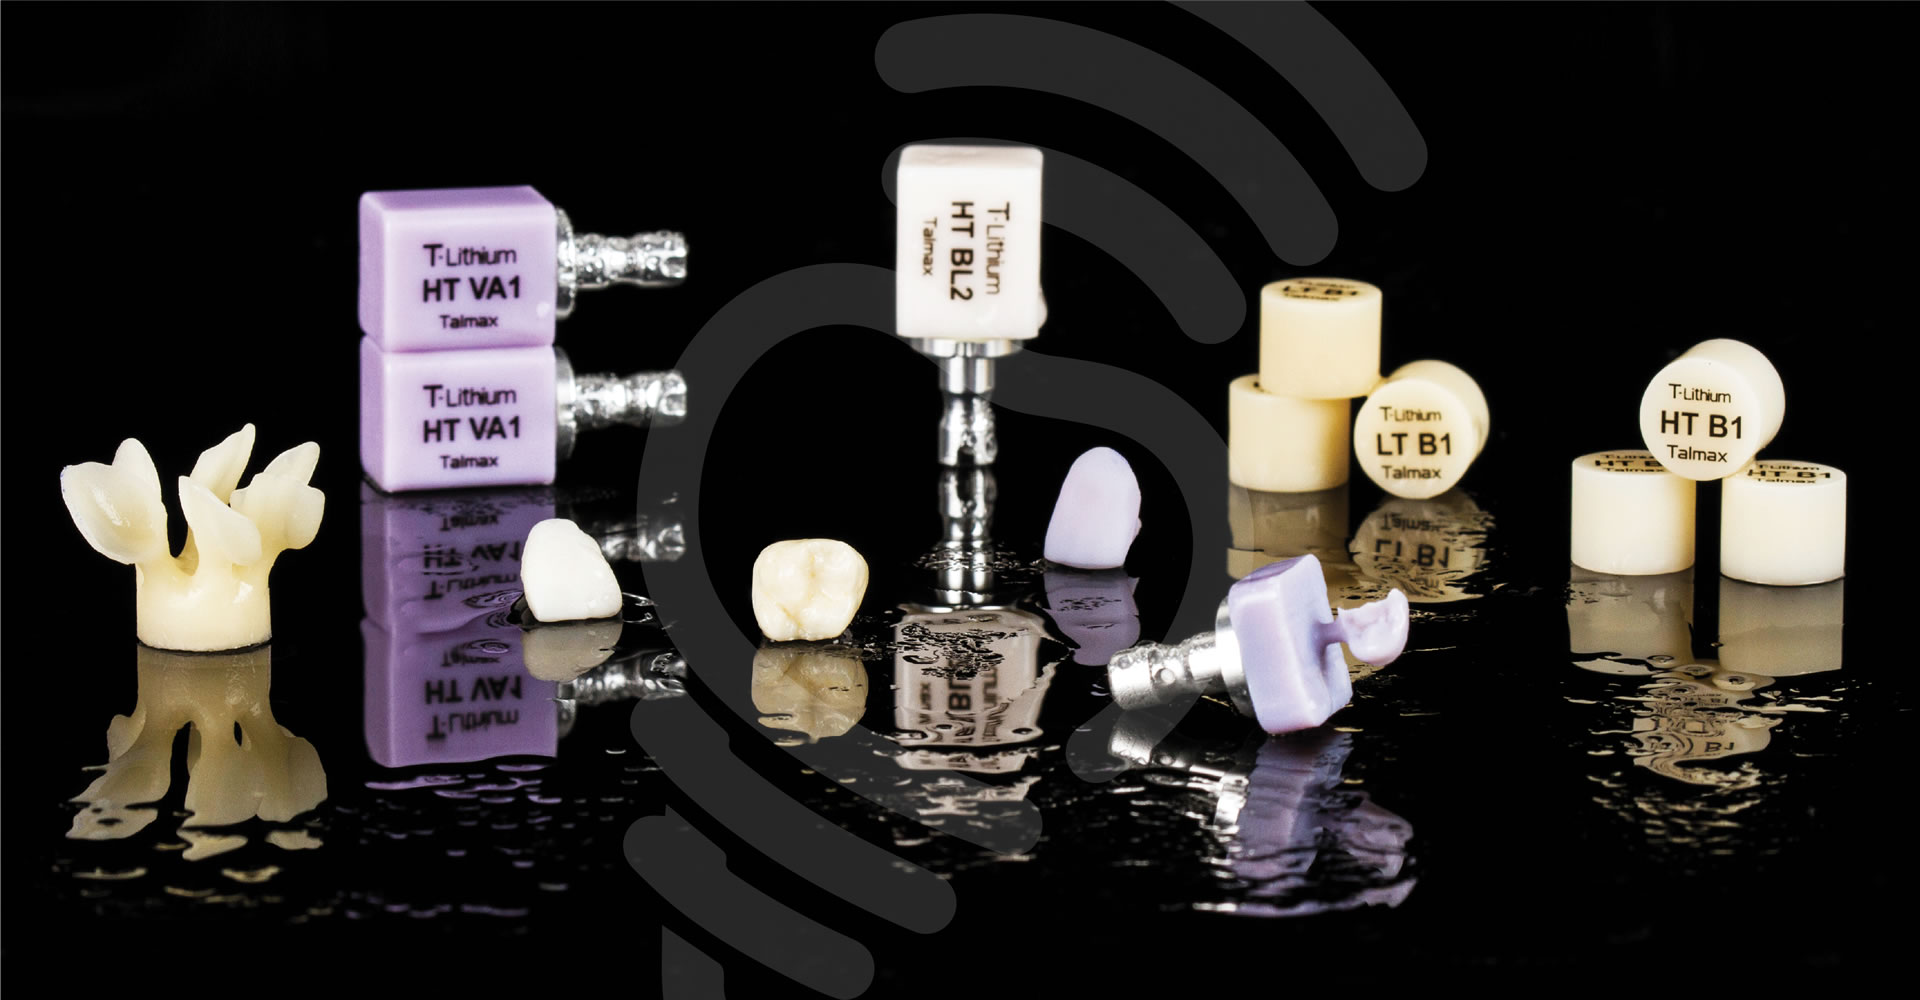 Talmax apresenta Linha de produtos T-Lithium